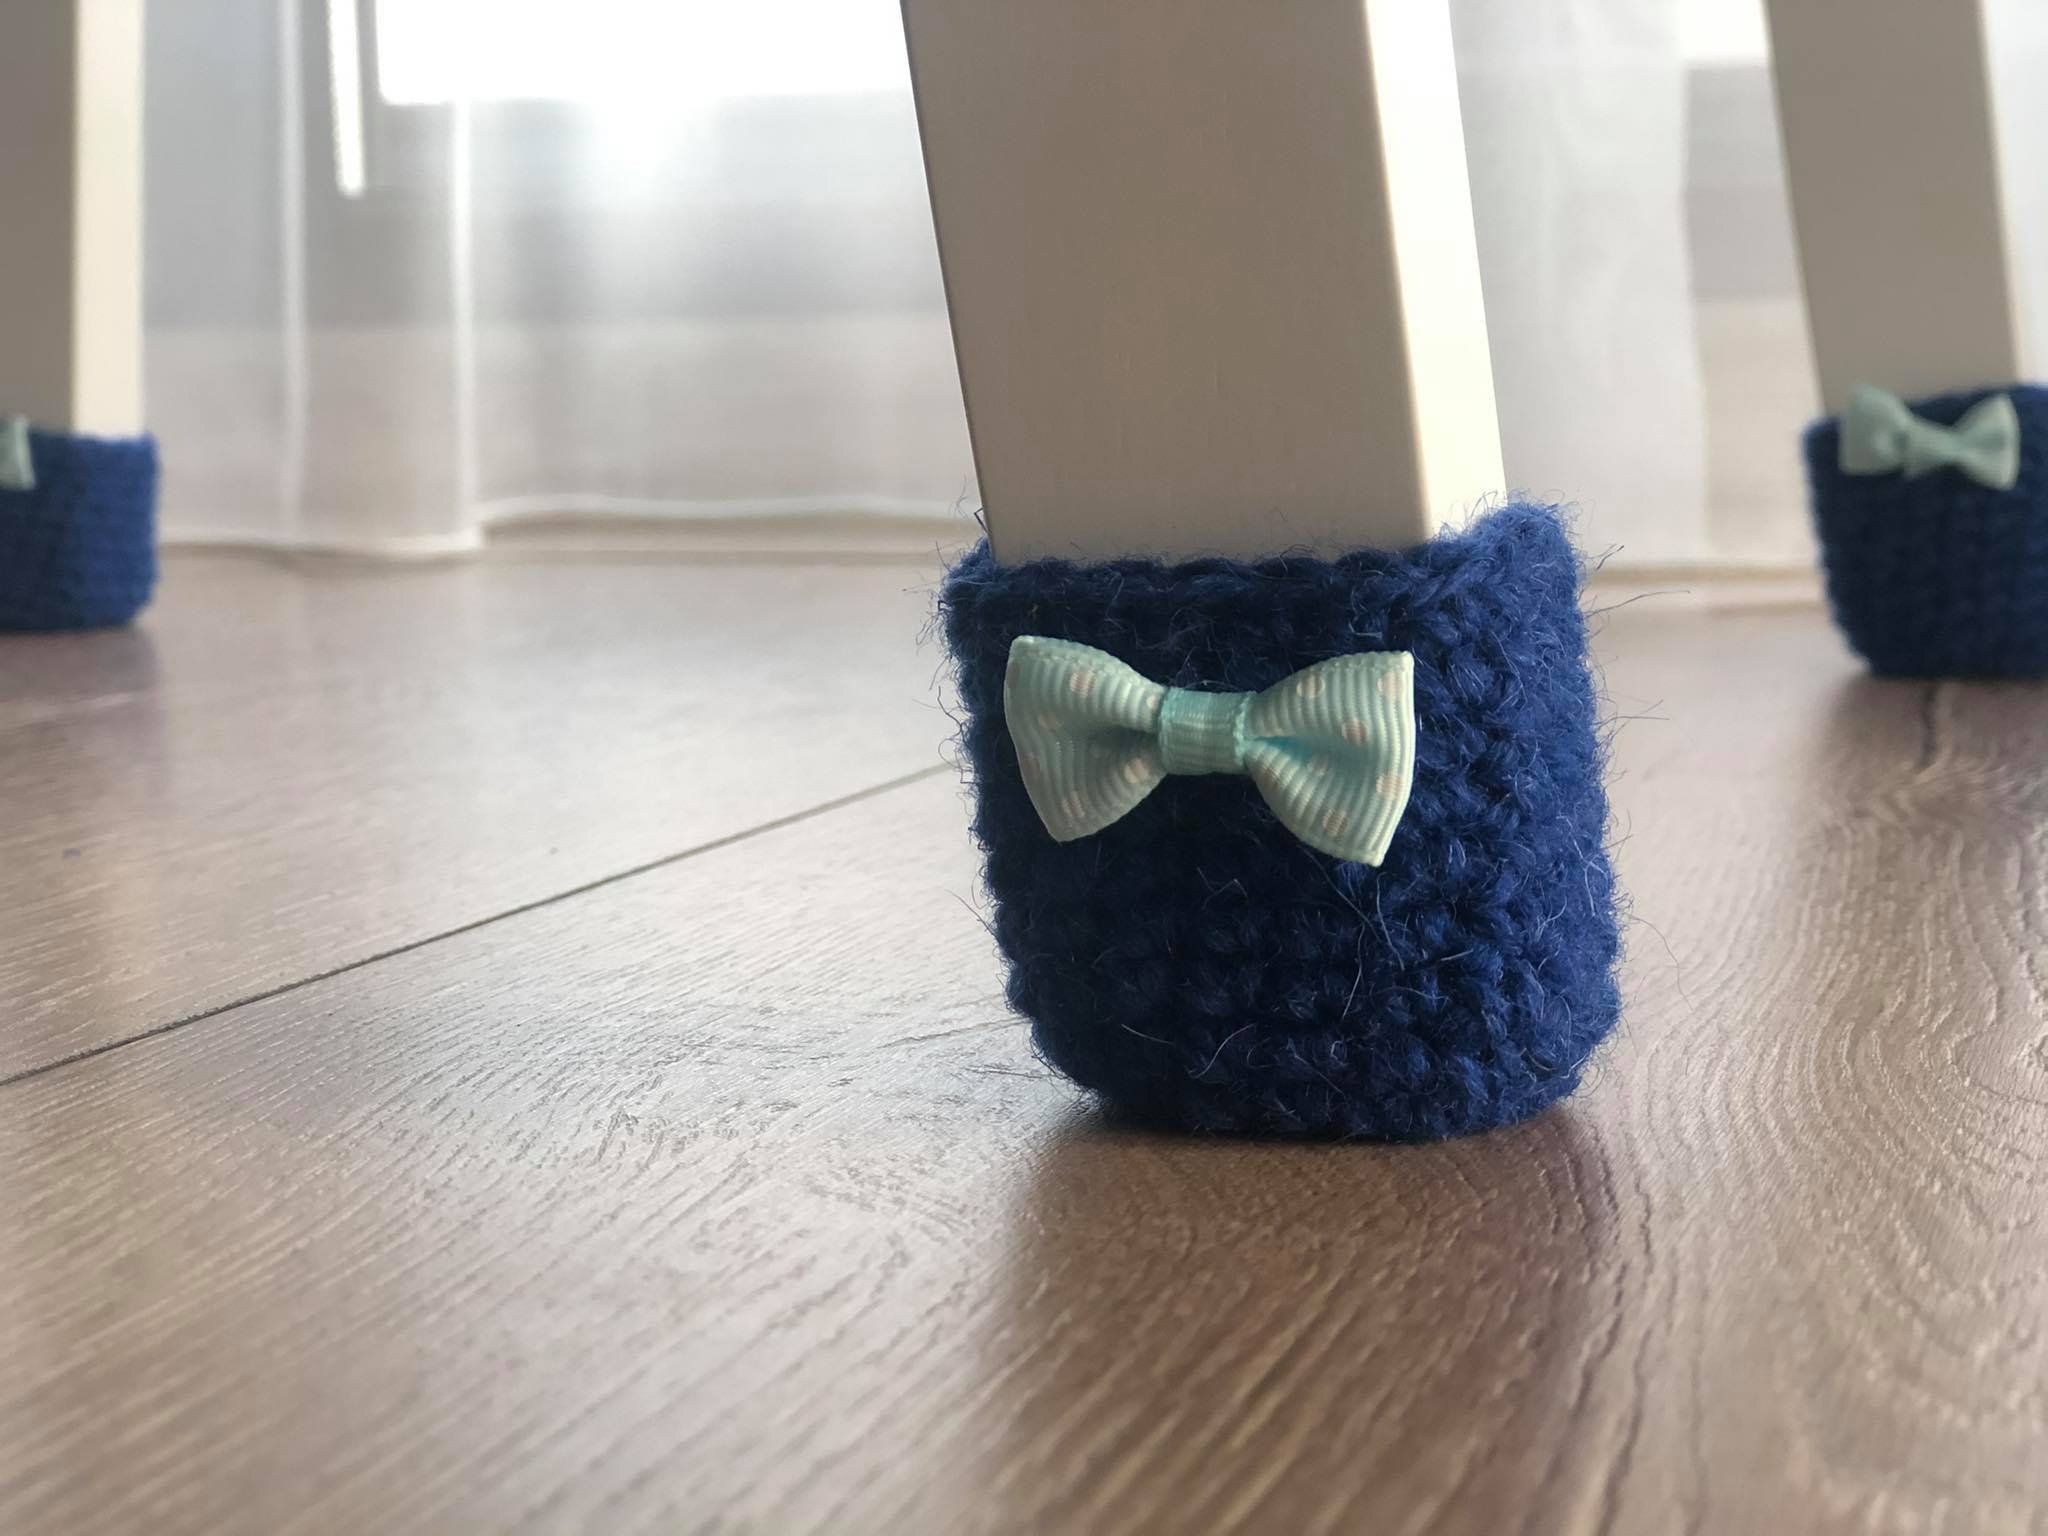 Chair Leg Socks Table Socks Furniture Accessories Home Etsy In 2020 Chair Legs Chair Covers Wedding Handmade Chair